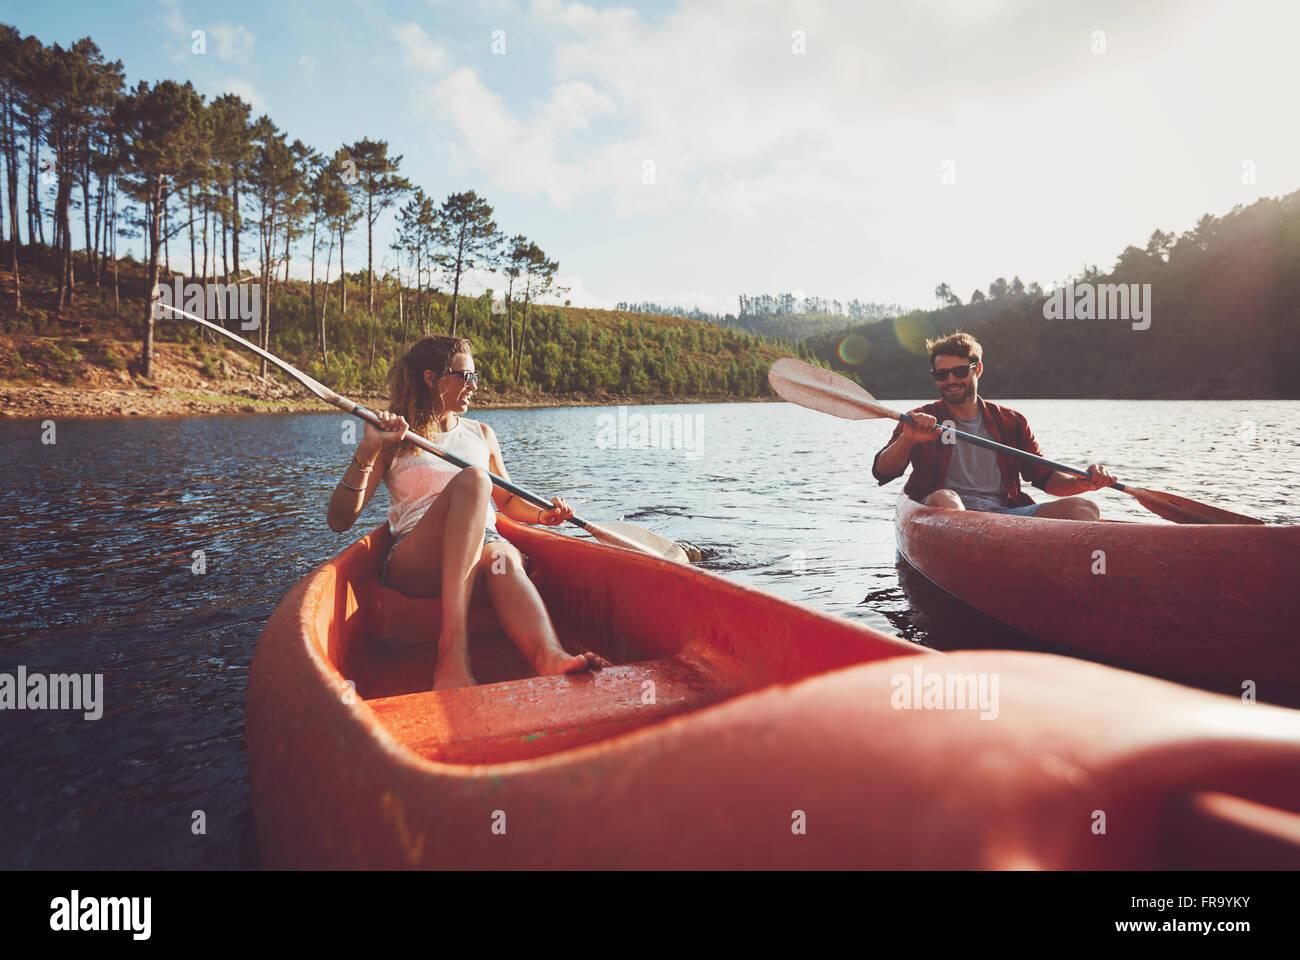 Junges Paar an einem See paddeln. Junge Kanuten an Sommertag am See rudern. Stockbild